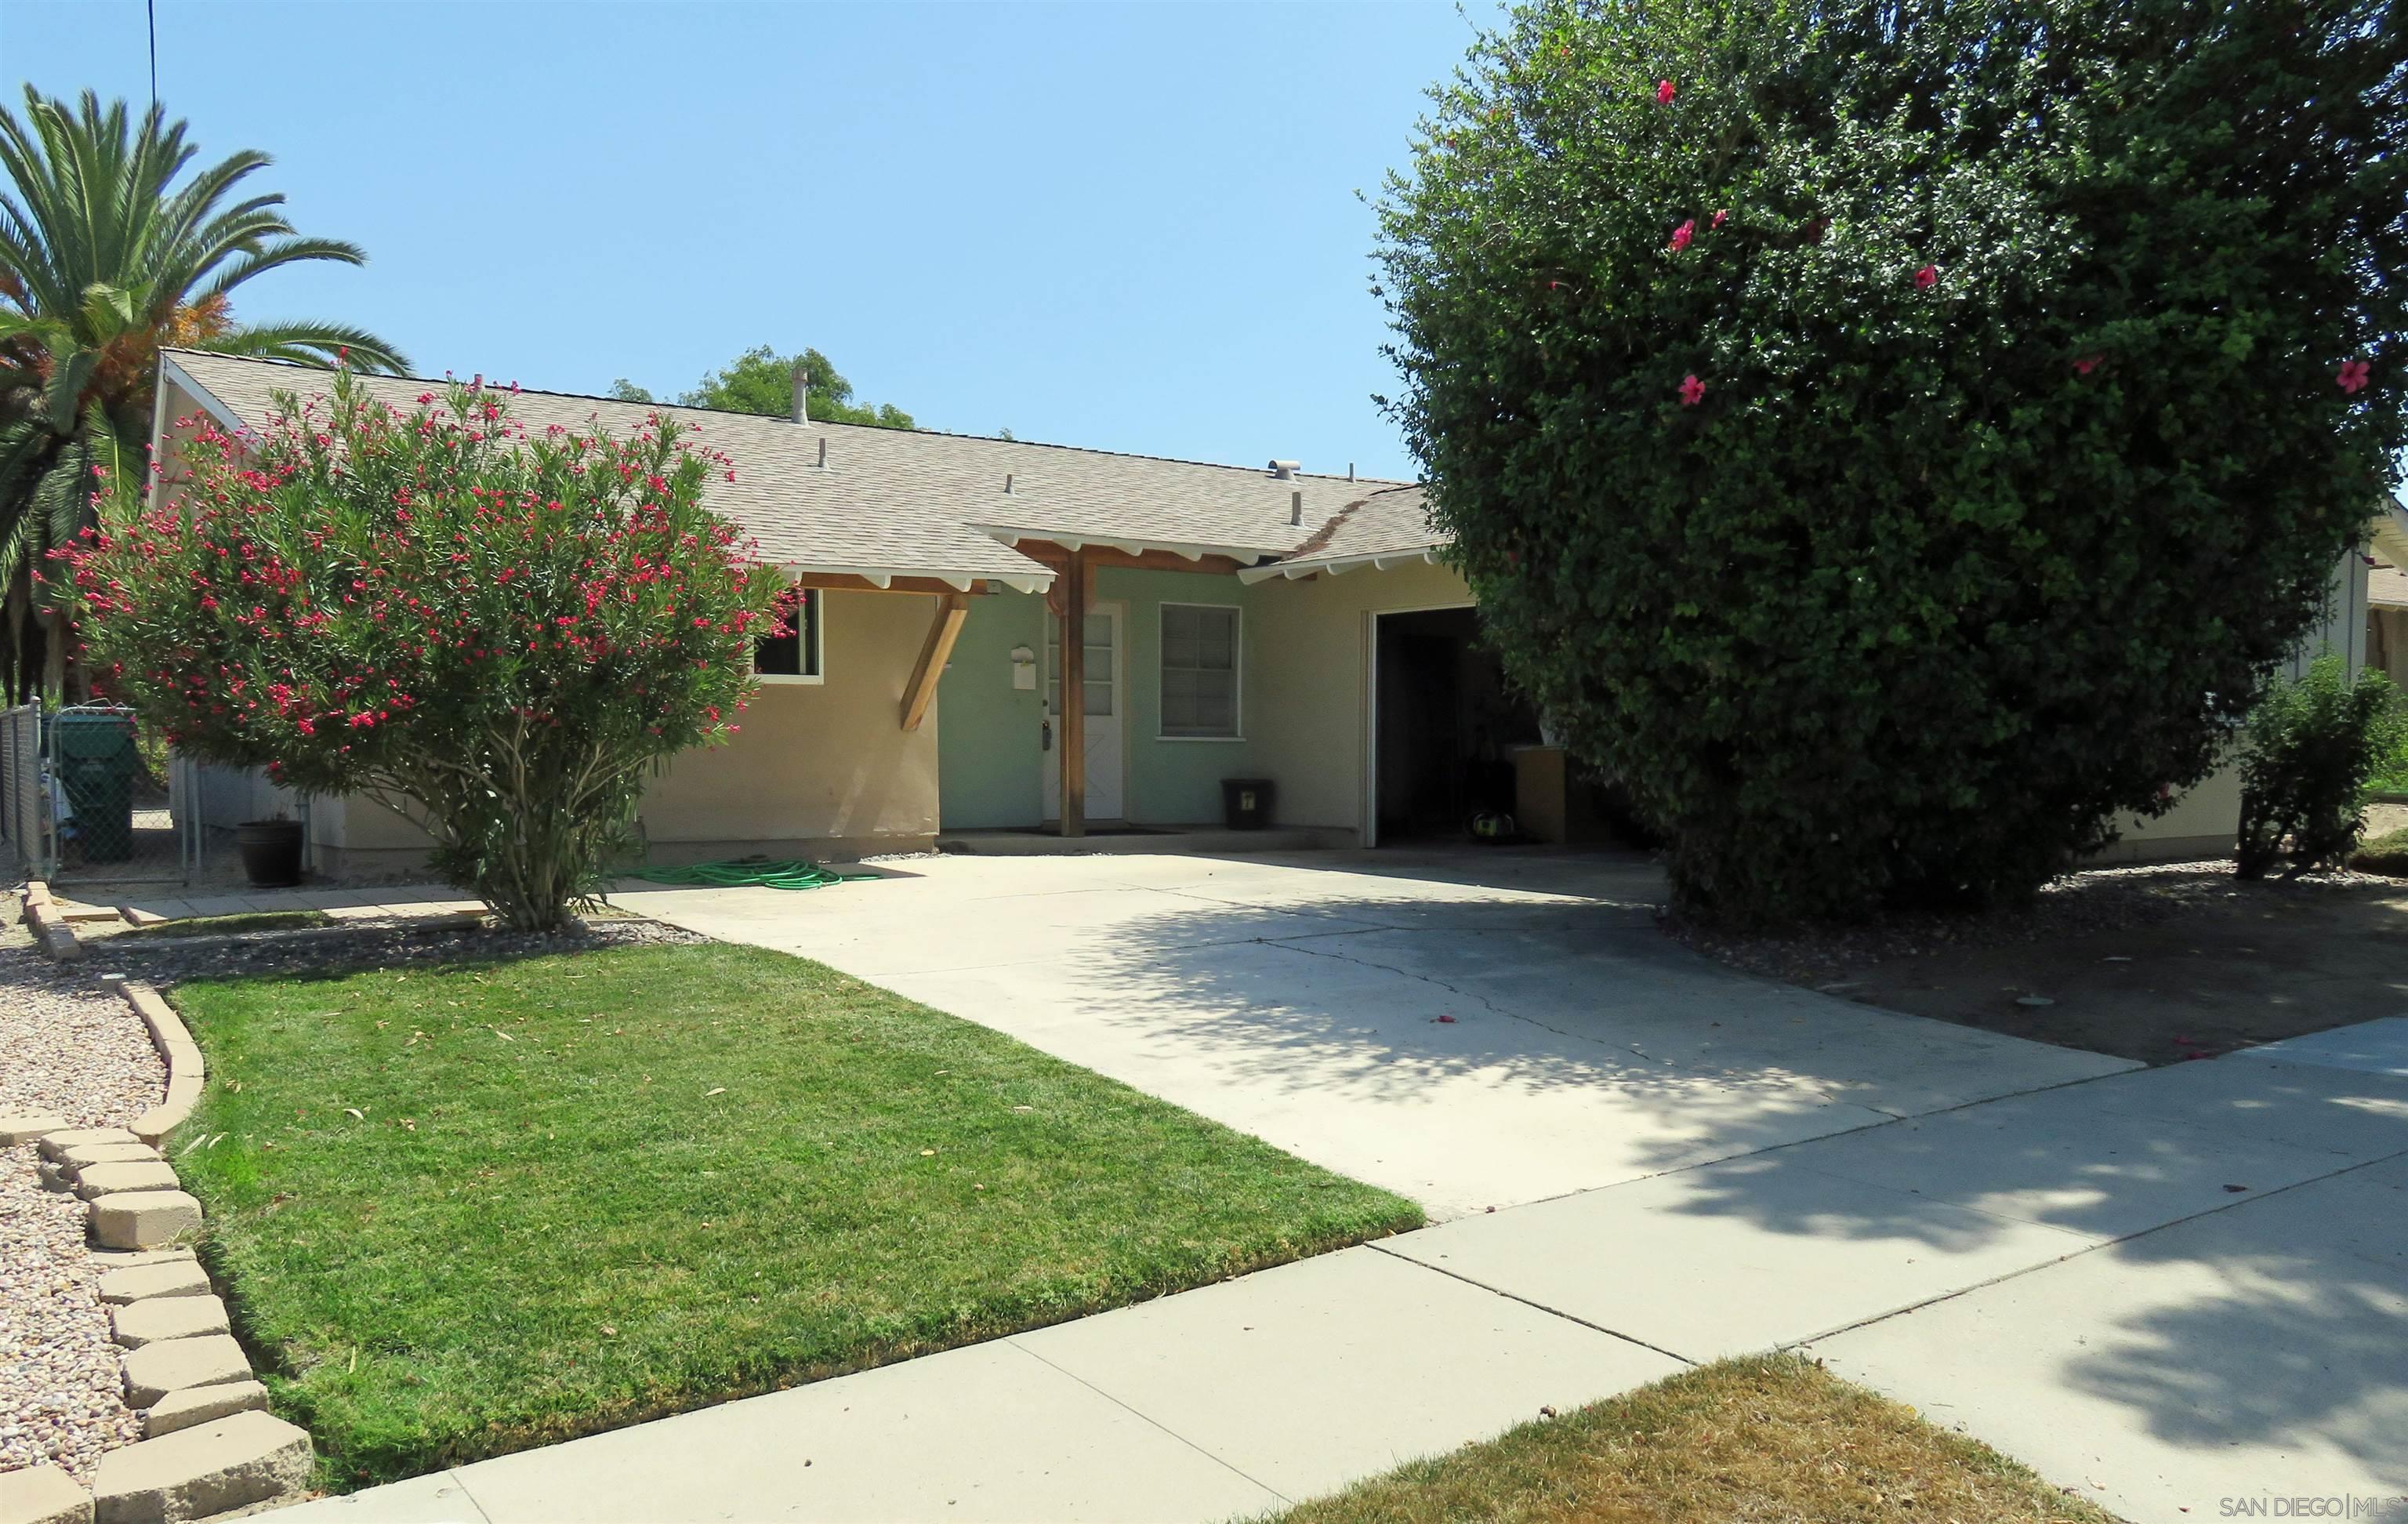 6361 Balsam Lake Ave, San Diego CA 92119